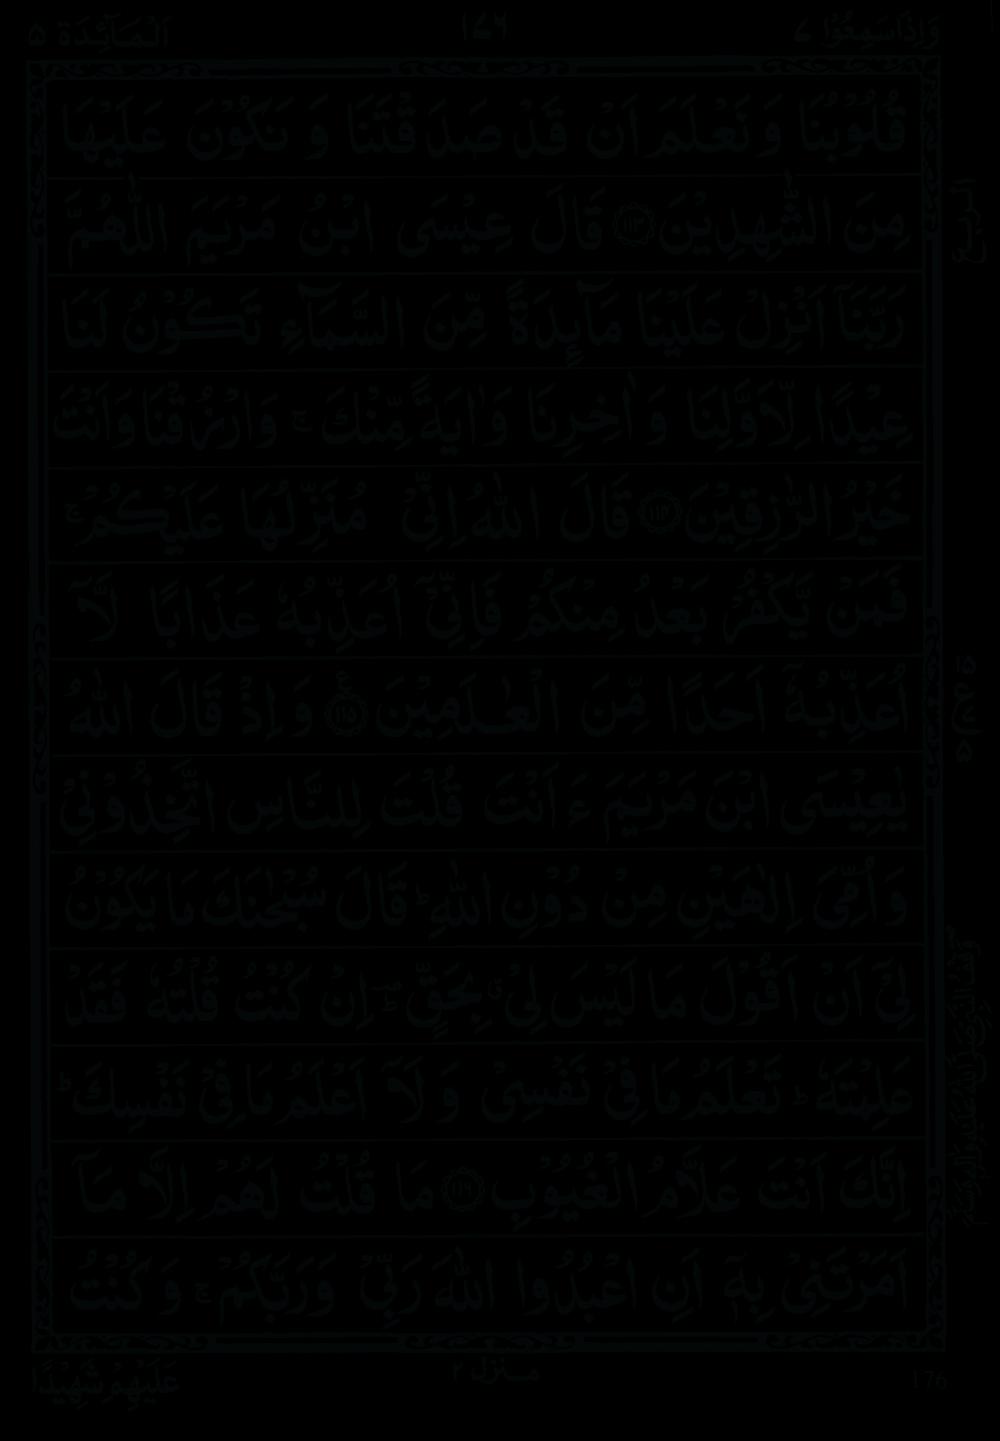 Quran Para 7 (Wa Iza Samiu) 7th Para Recite Online and PDF